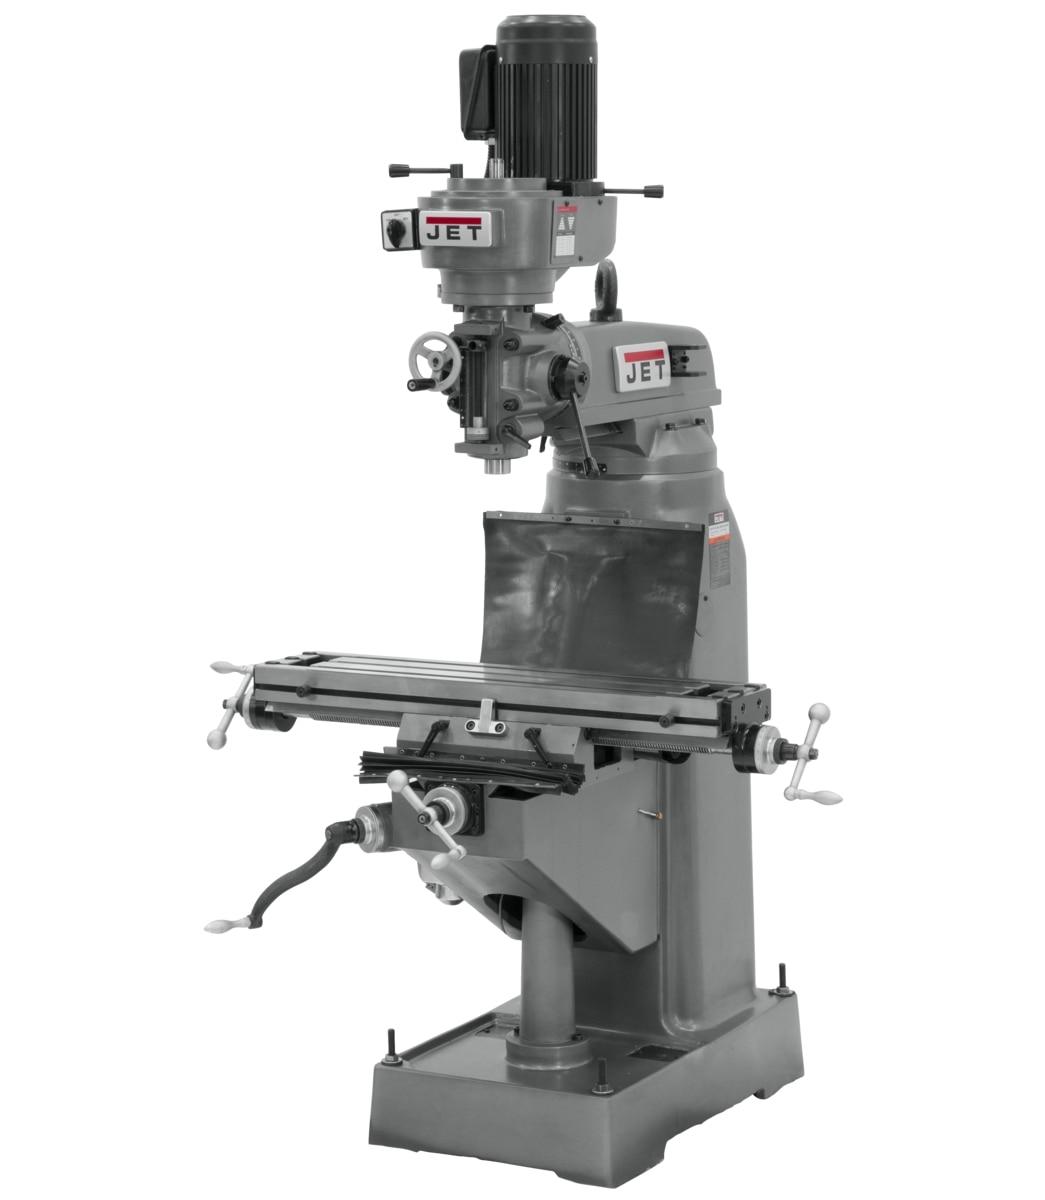 JVM-836-1 Step Pulley Milling Machine 115V 1Ph